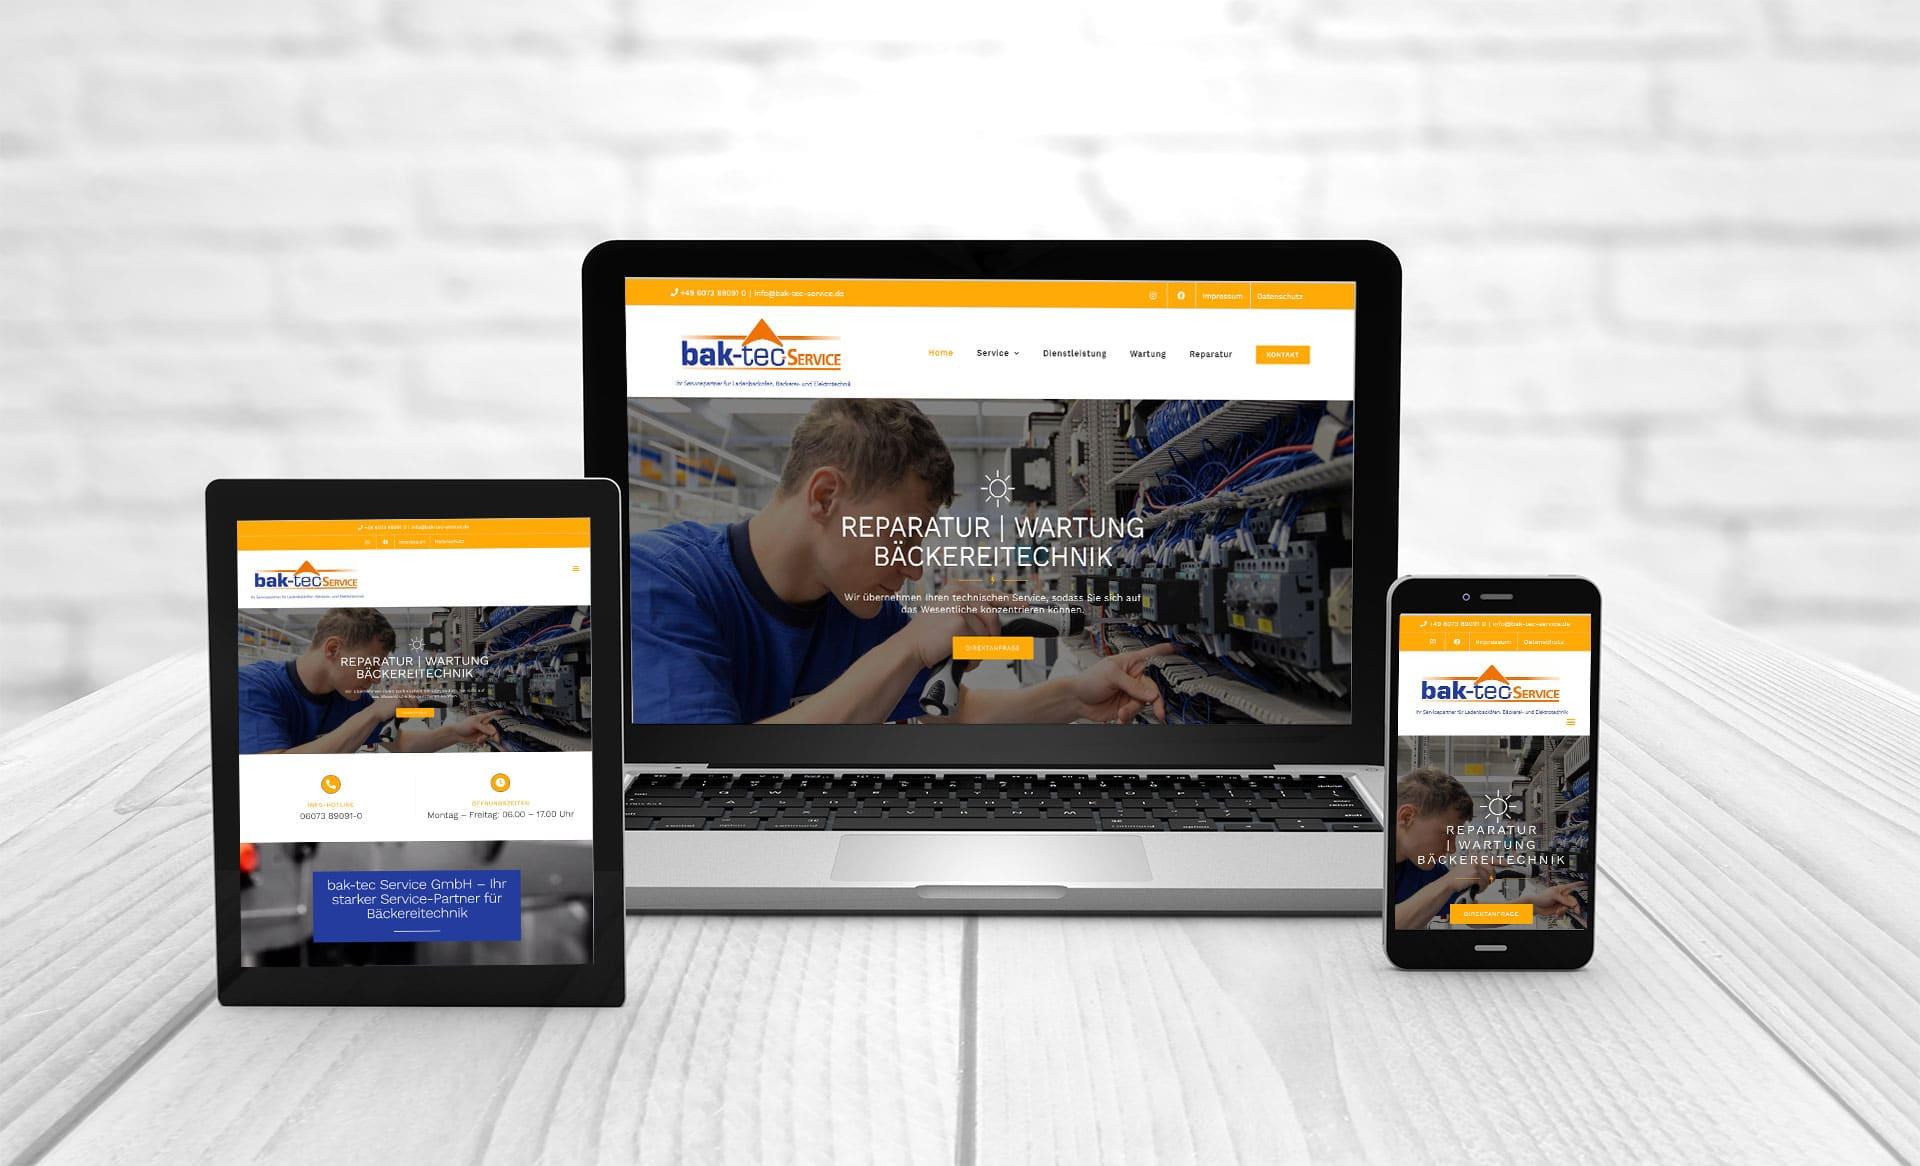 Professional web design, references Bak-tec-Service GmbH